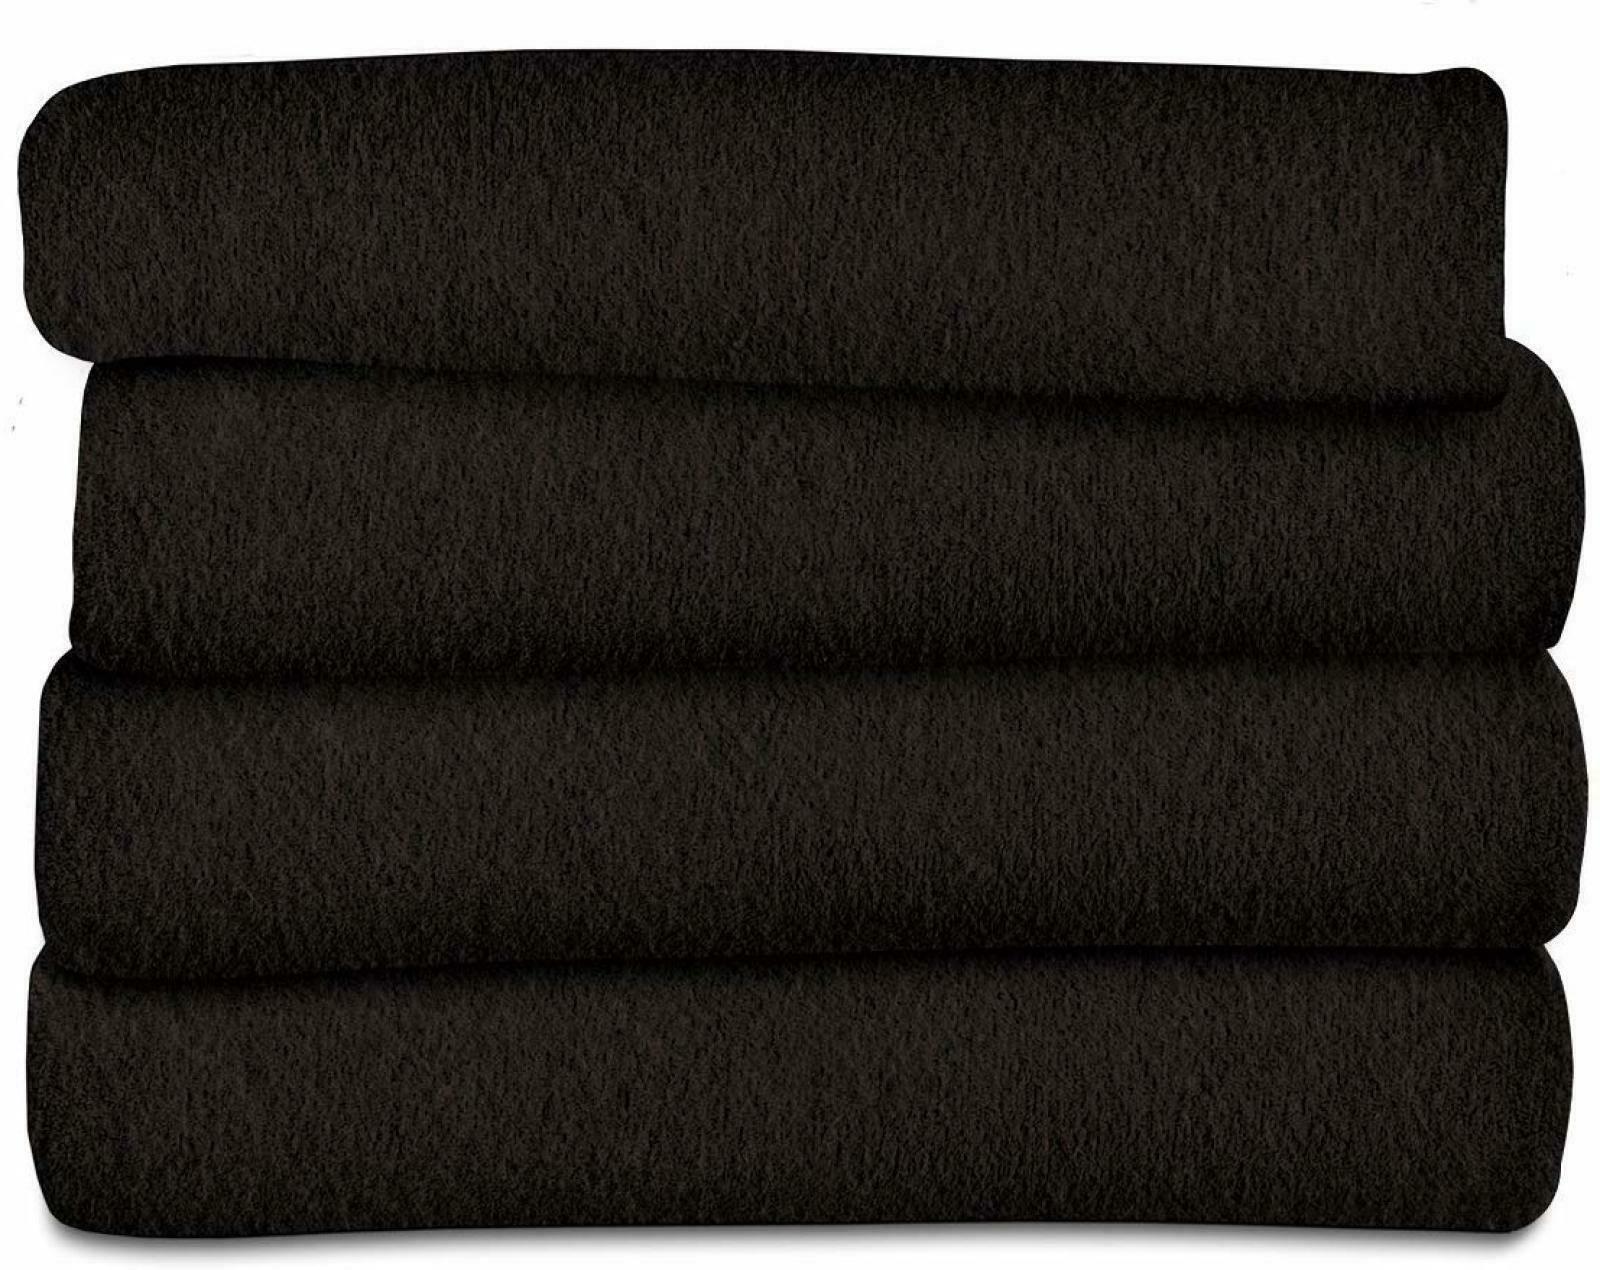 electric blanket fleece heated throw bedding winter